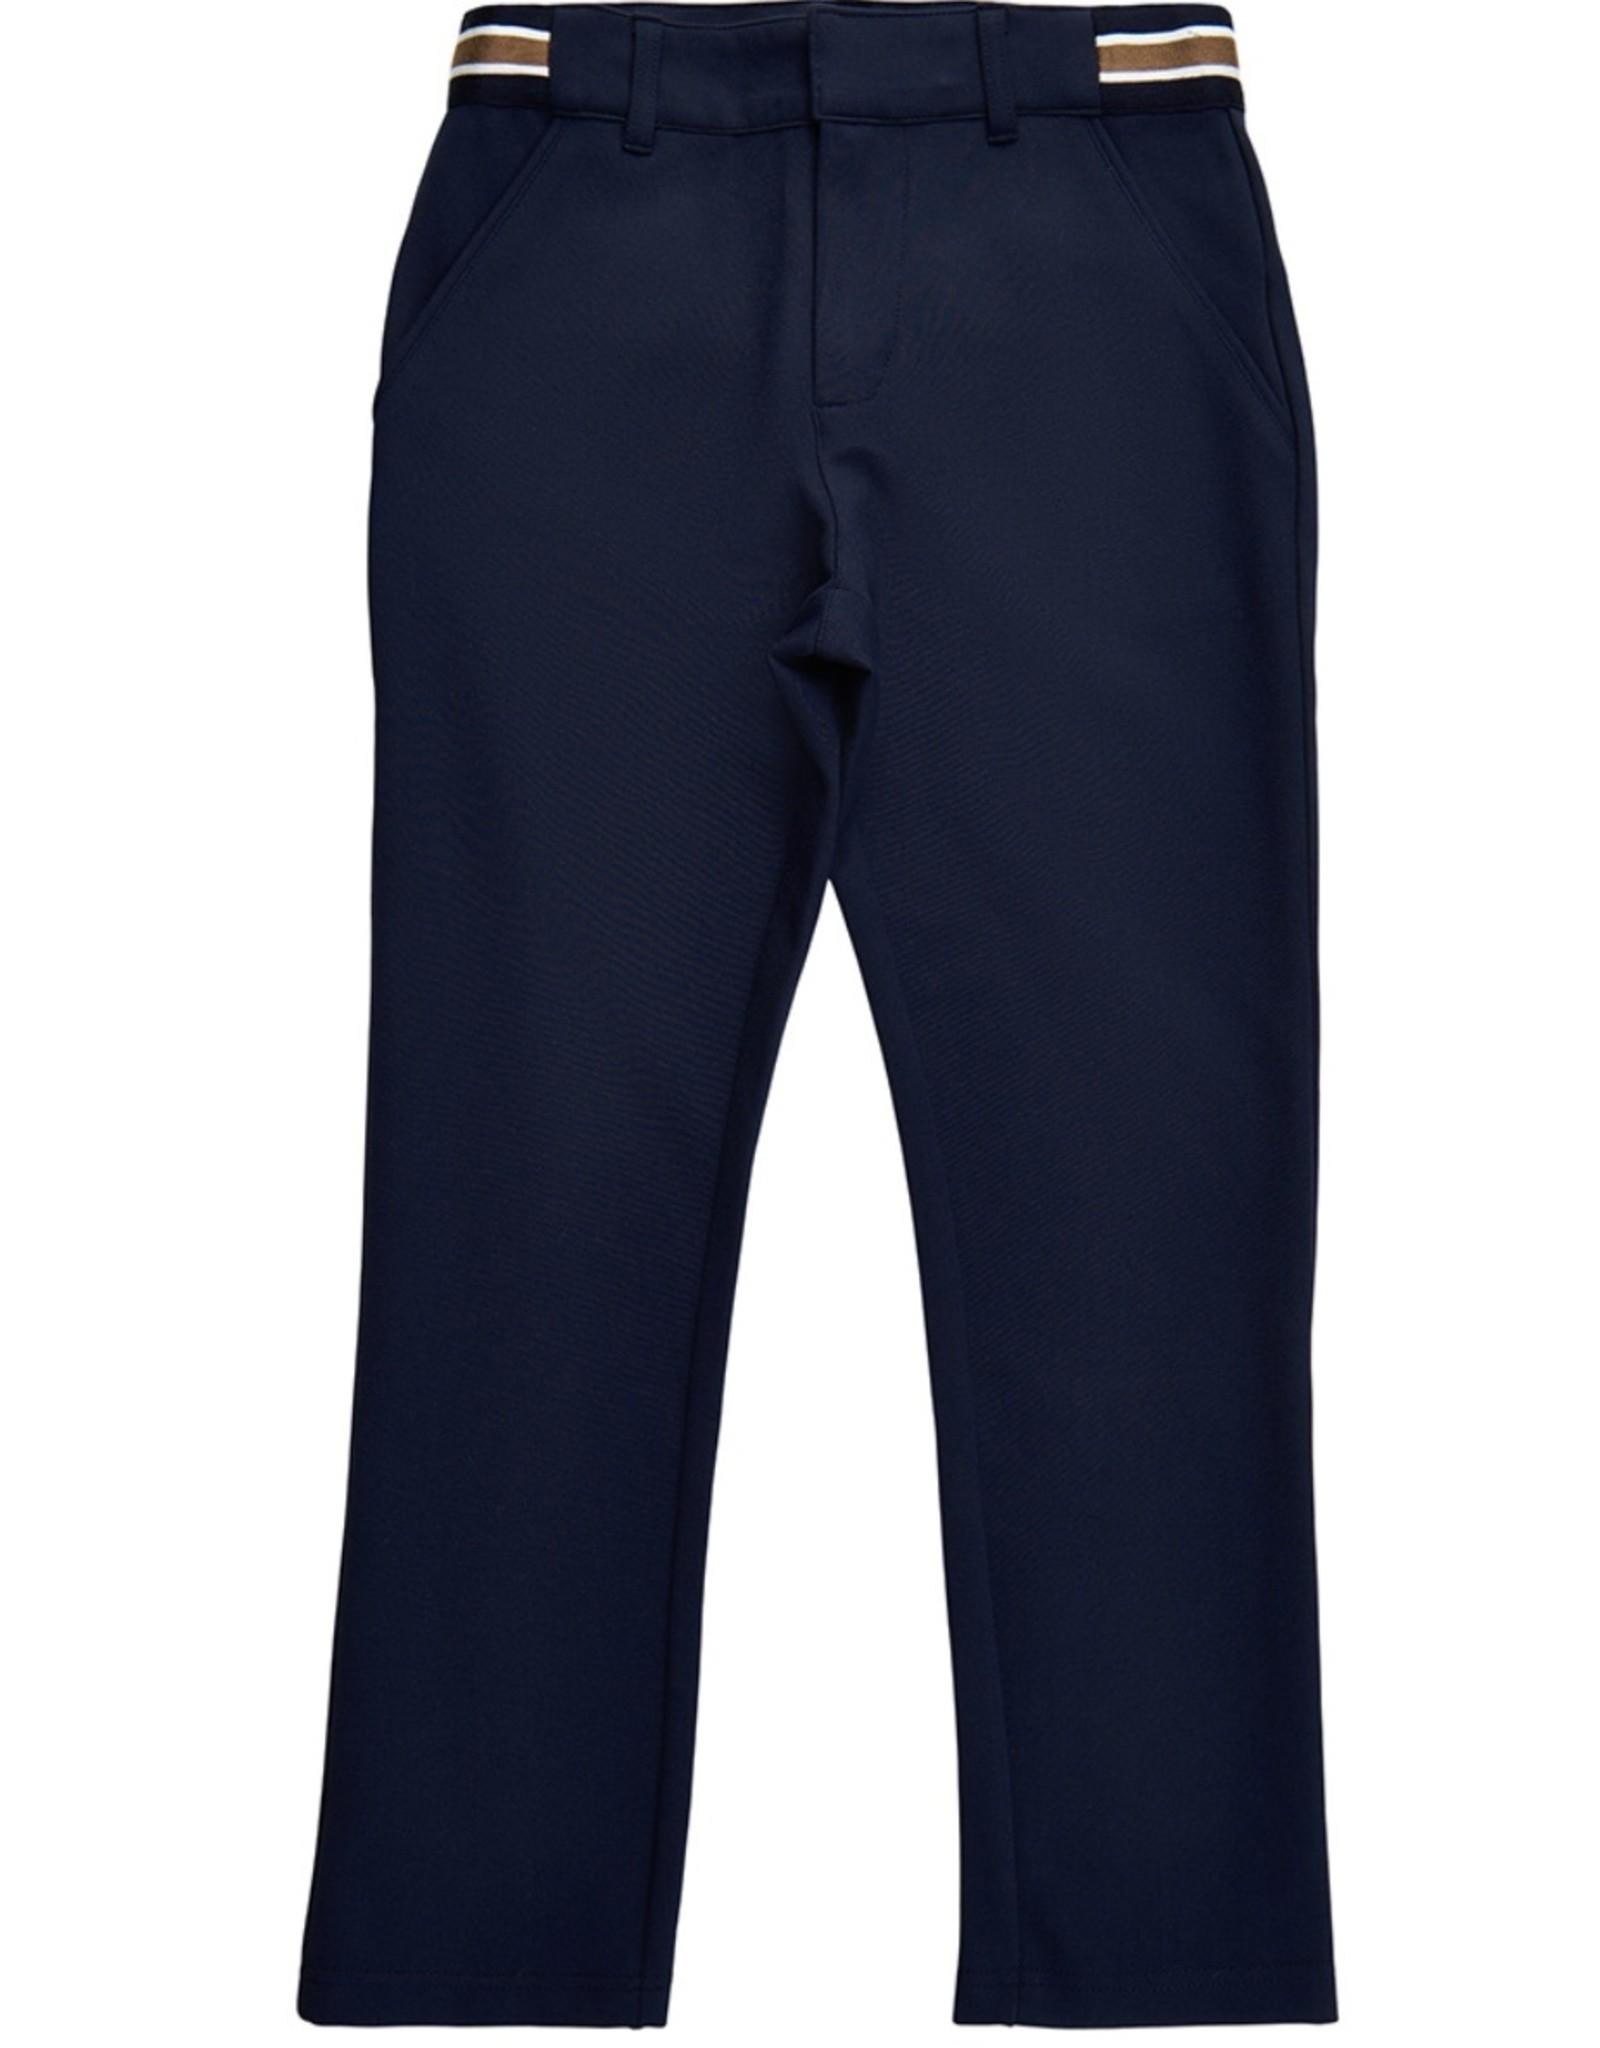 The New TnValde Chino broek